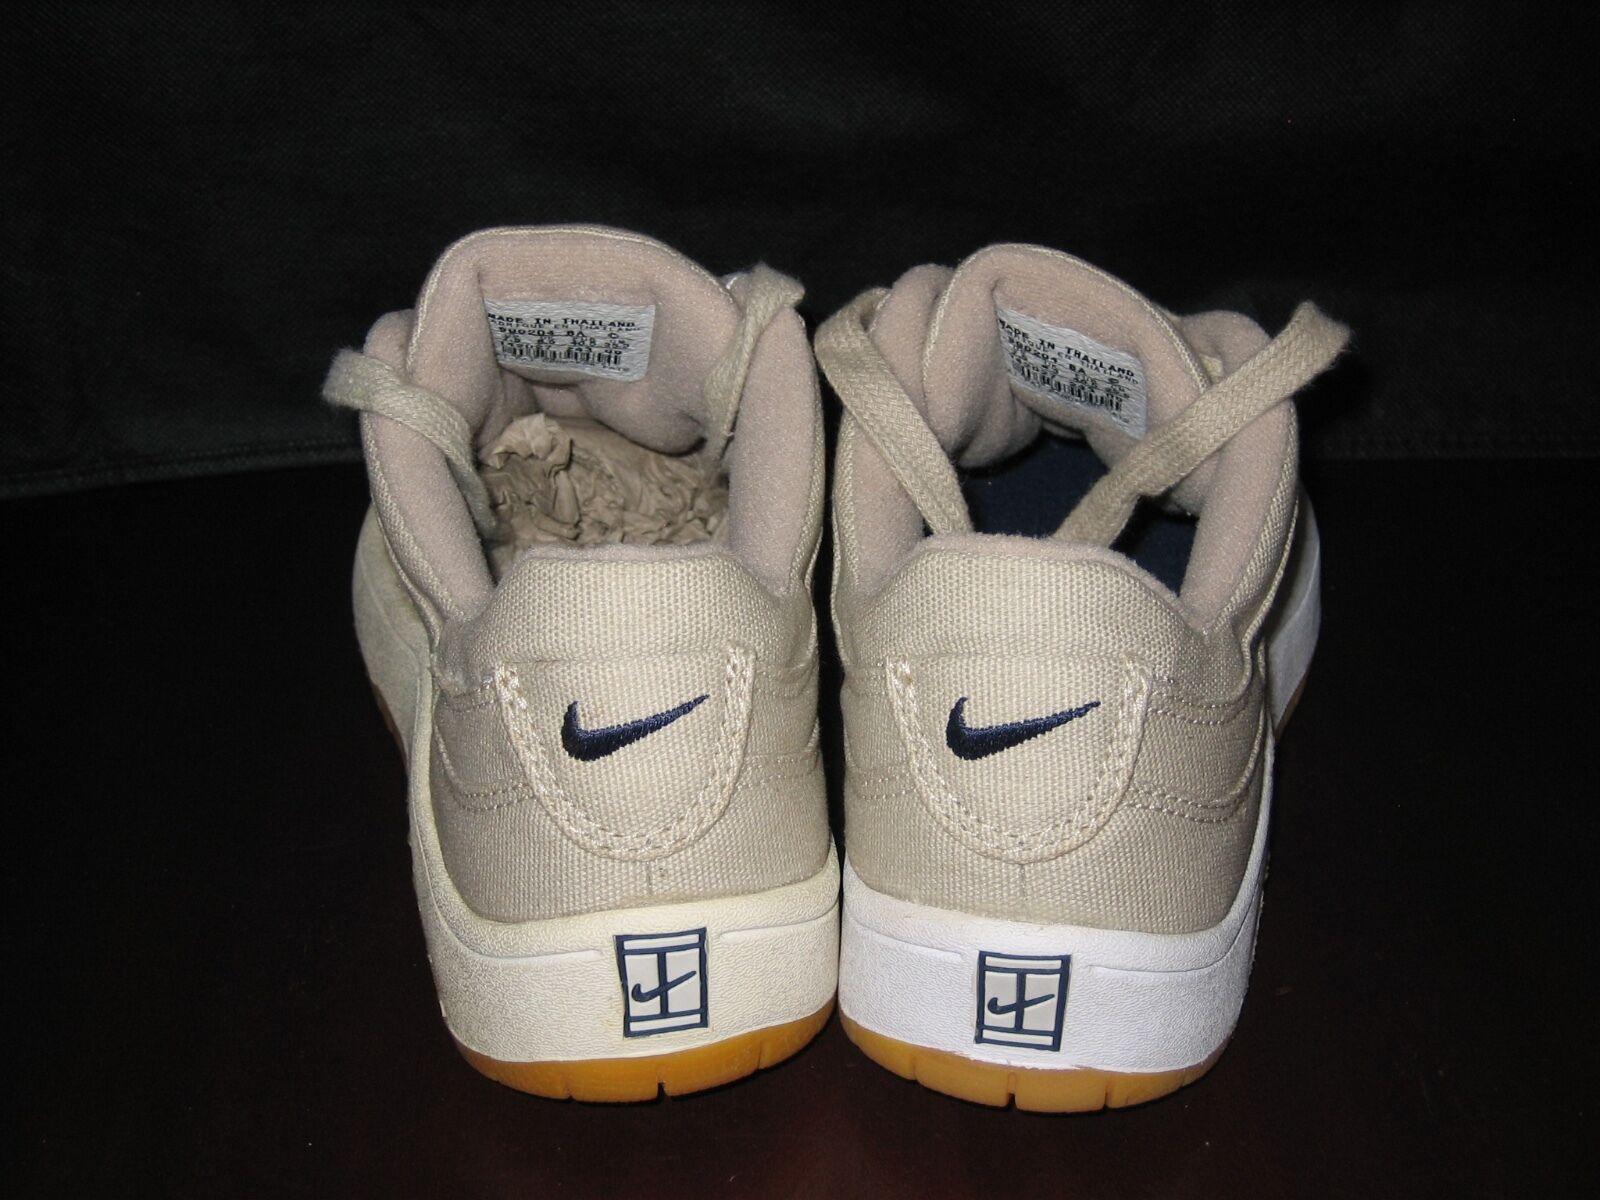 Nike Montara NOS Canvas '99 USA7,5 NIB NOS Montara vintage ORIGINAL Turnschuhe skate urban air 552987